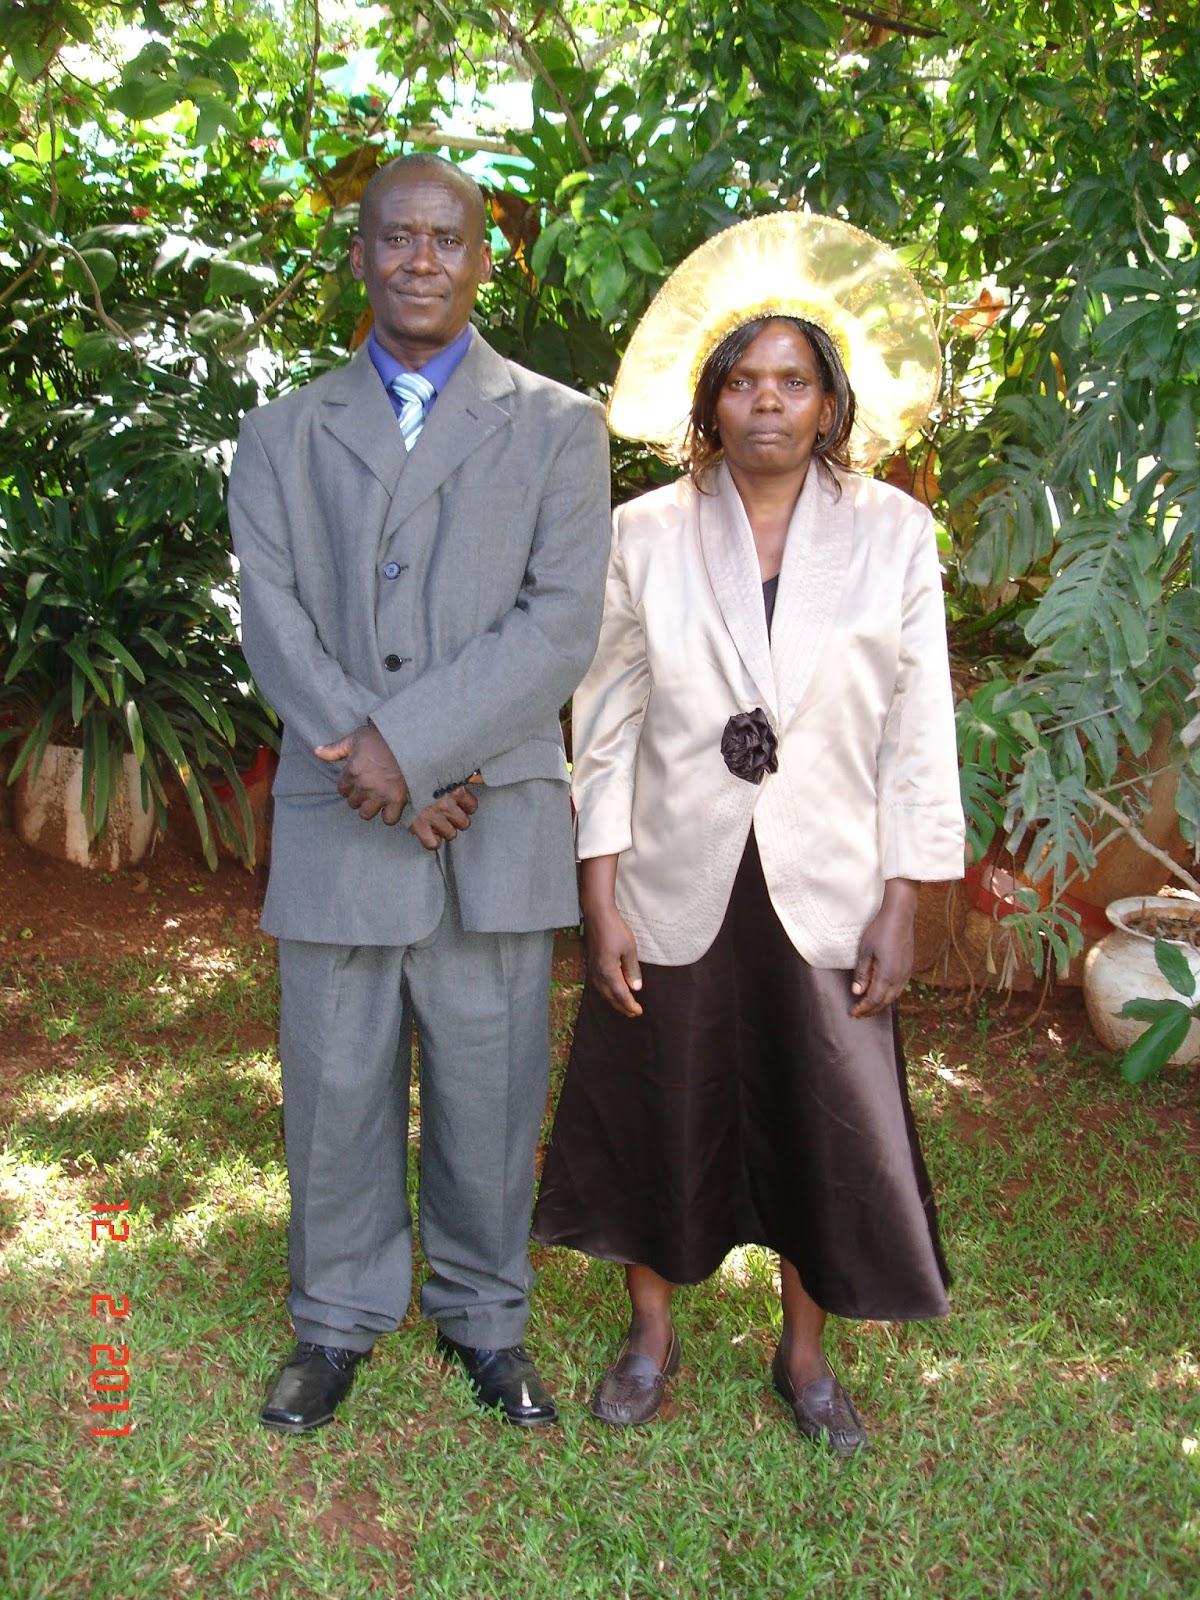 Tapiwa Zuze - The Inspirational Life Of My Mother